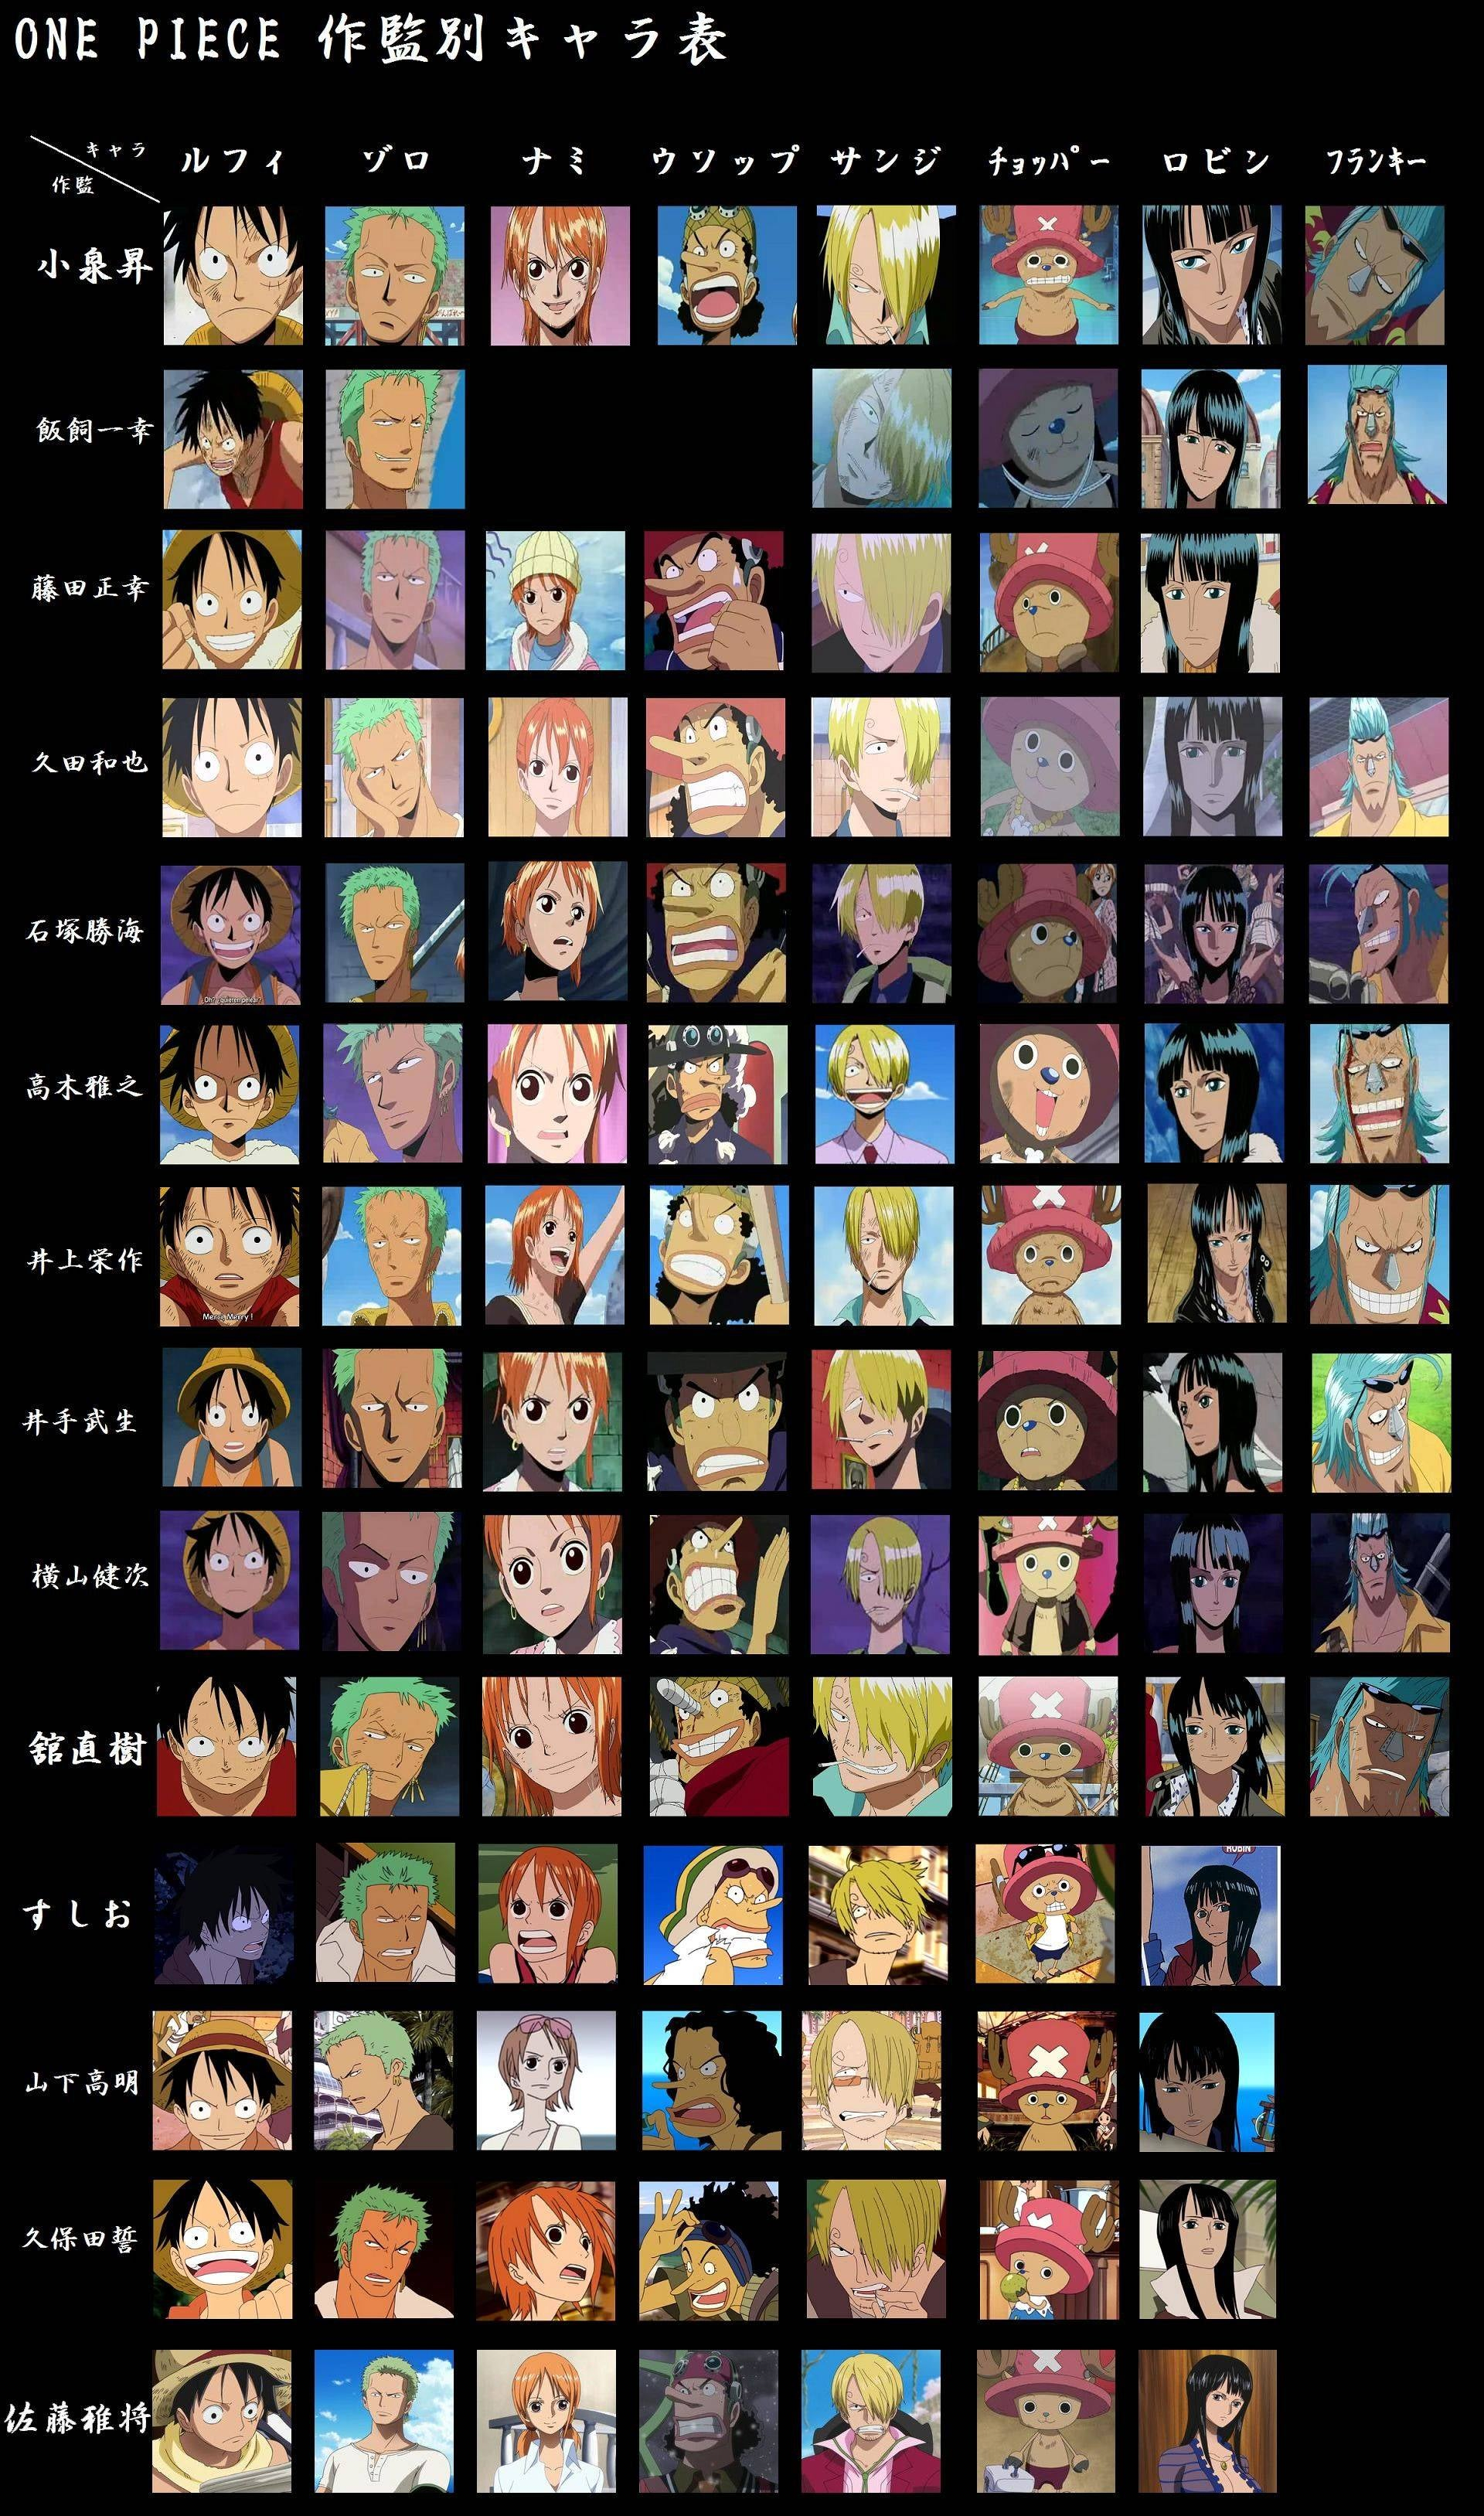 The Subtle Ways Anime Changes